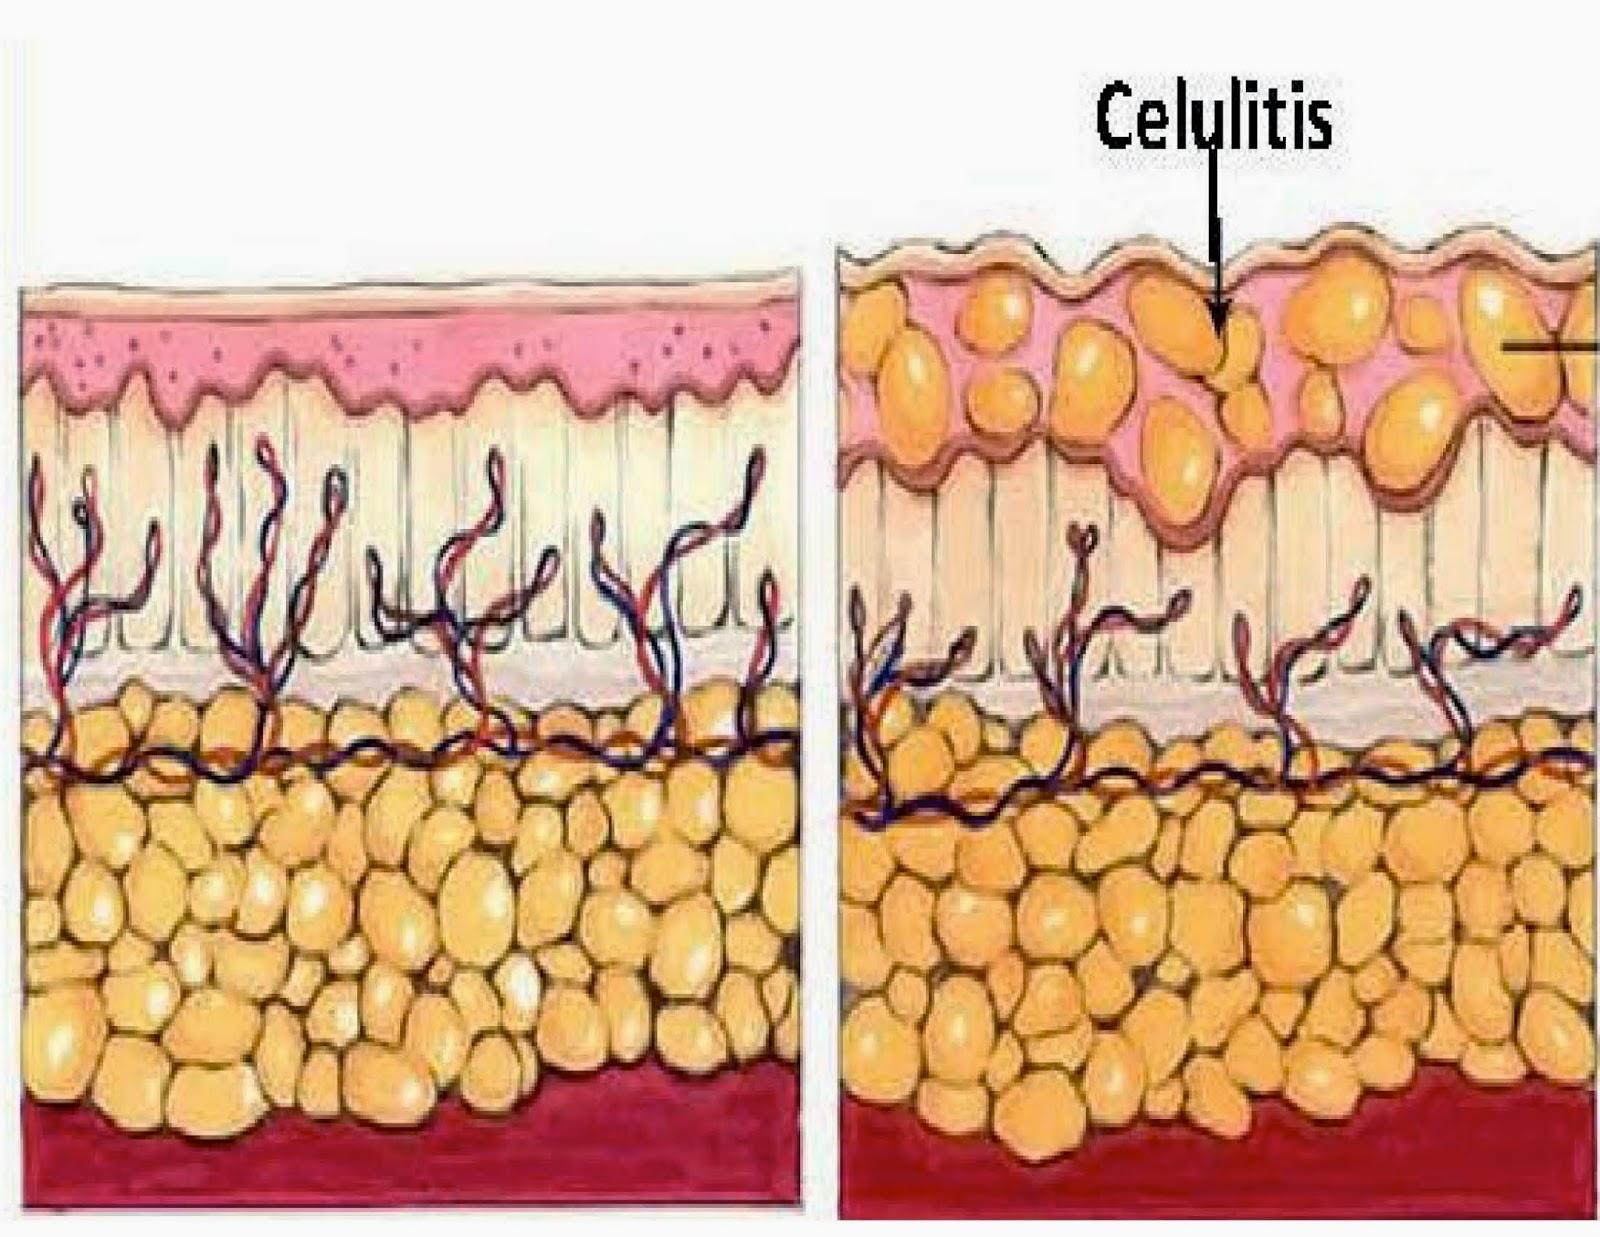 Celulitis 2014